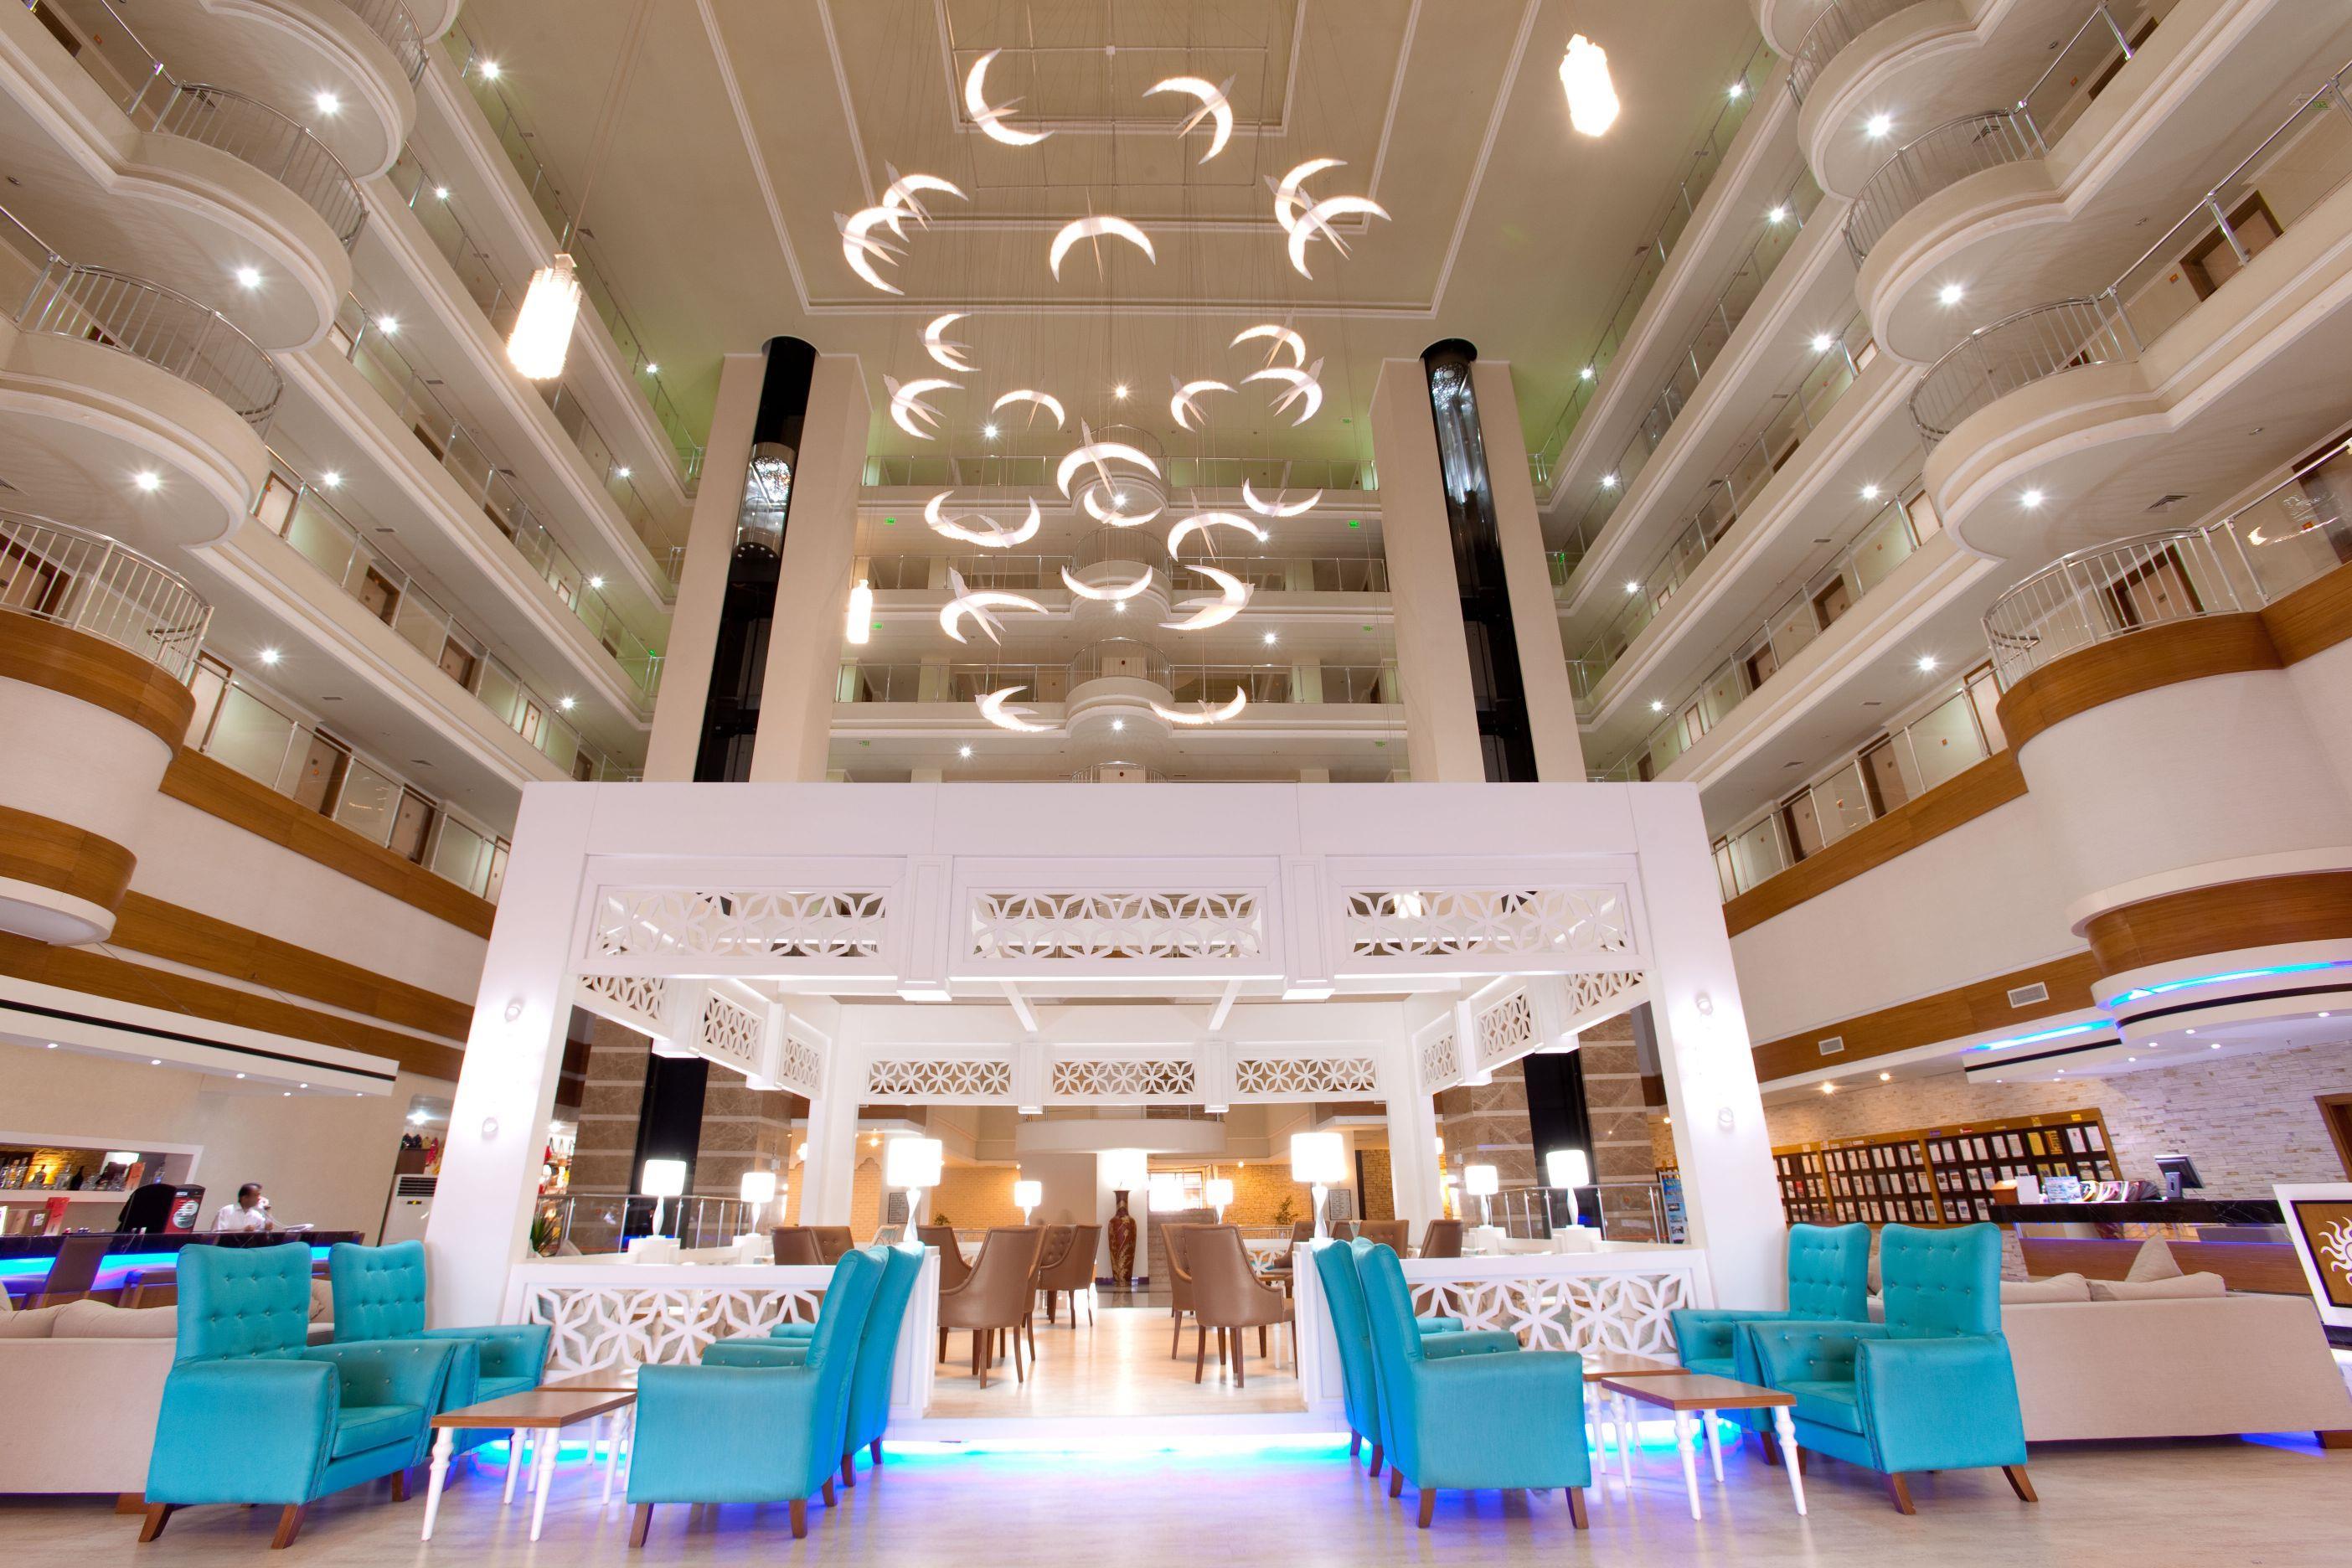 http://www.orextravel.sk/OREX/hotelphotos/stella-beach-hotel-alanya-general-0012.jpg